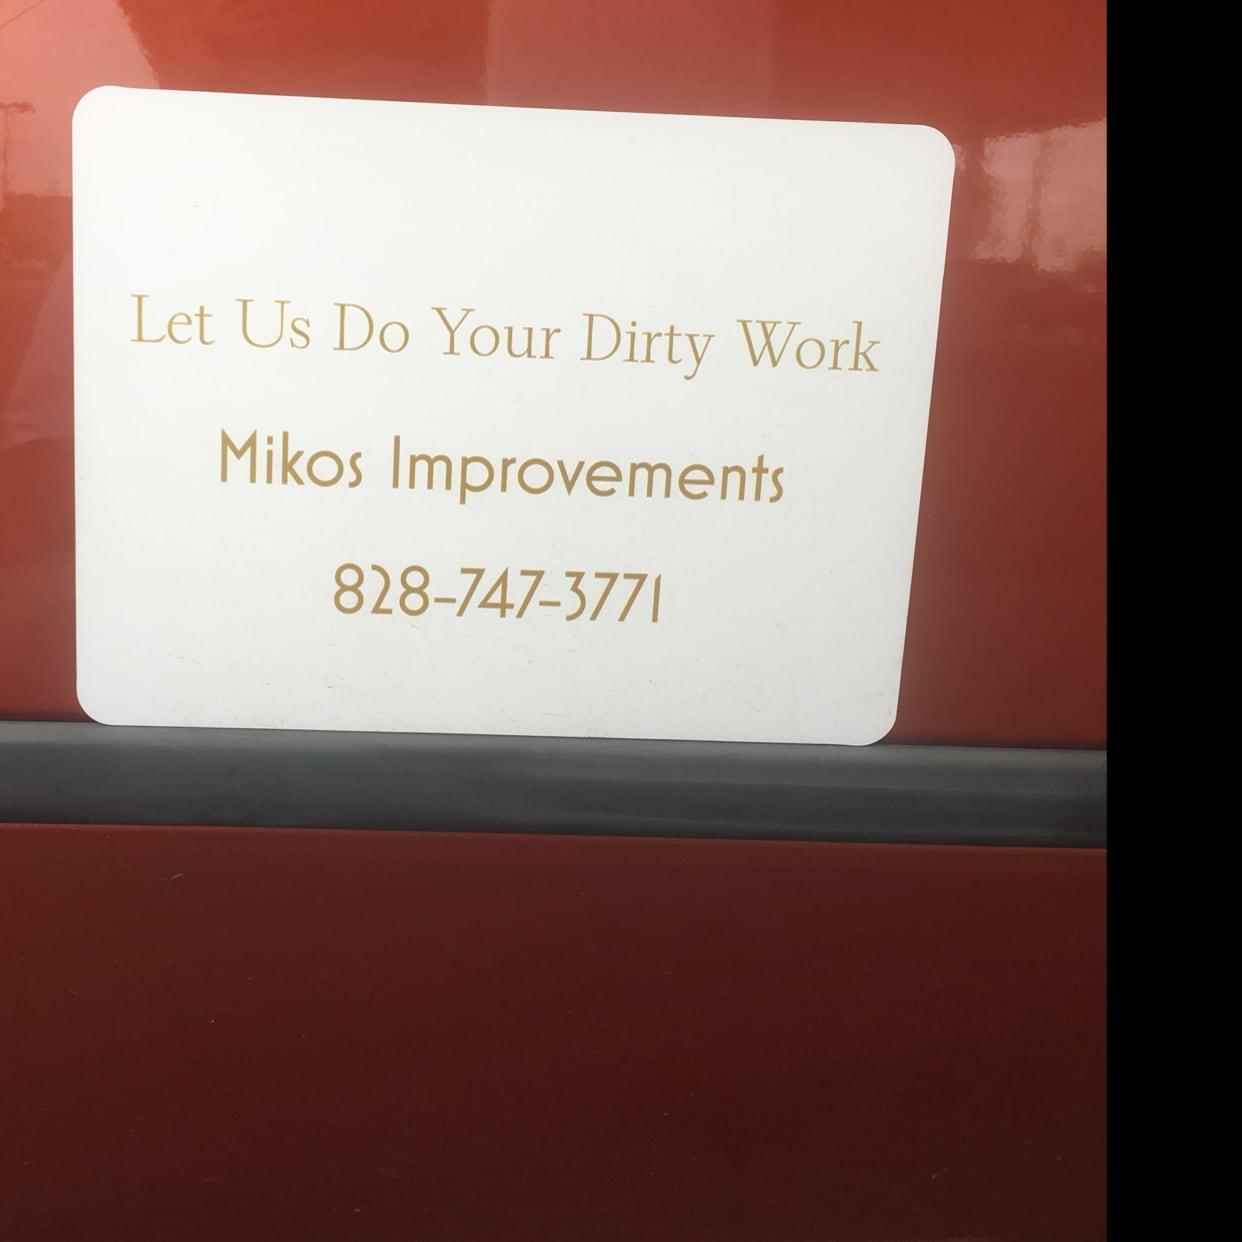 Mikos Improvements